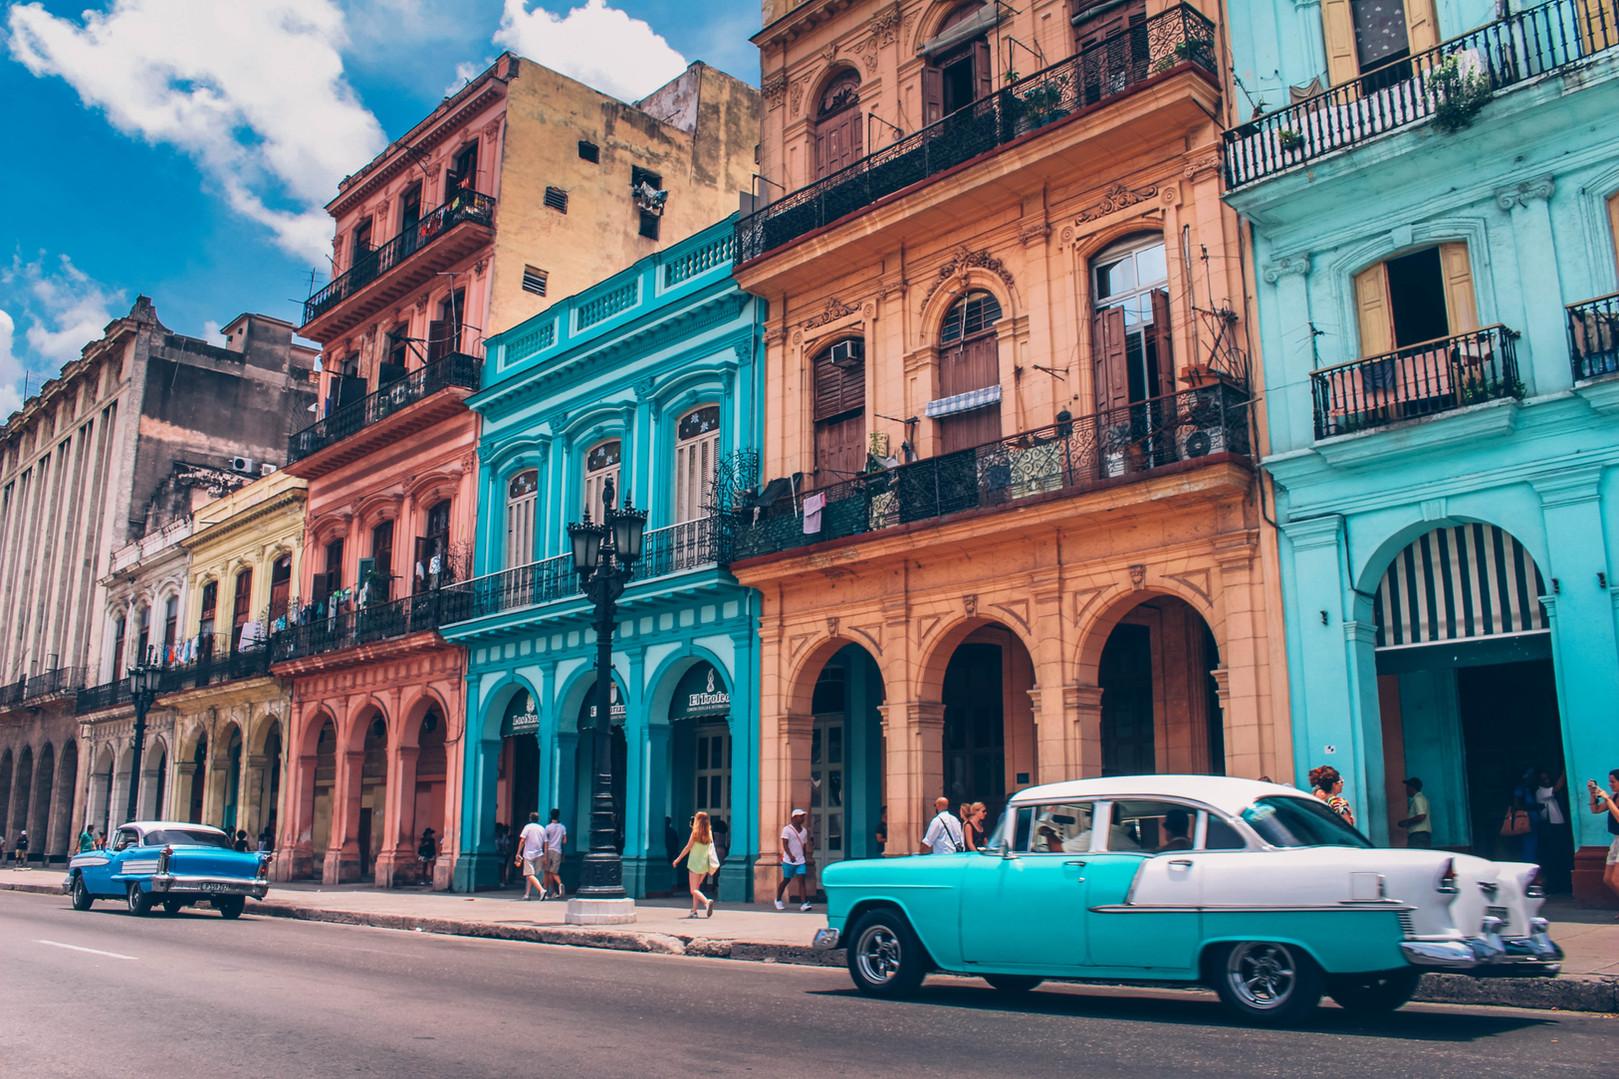 Edificios de colores